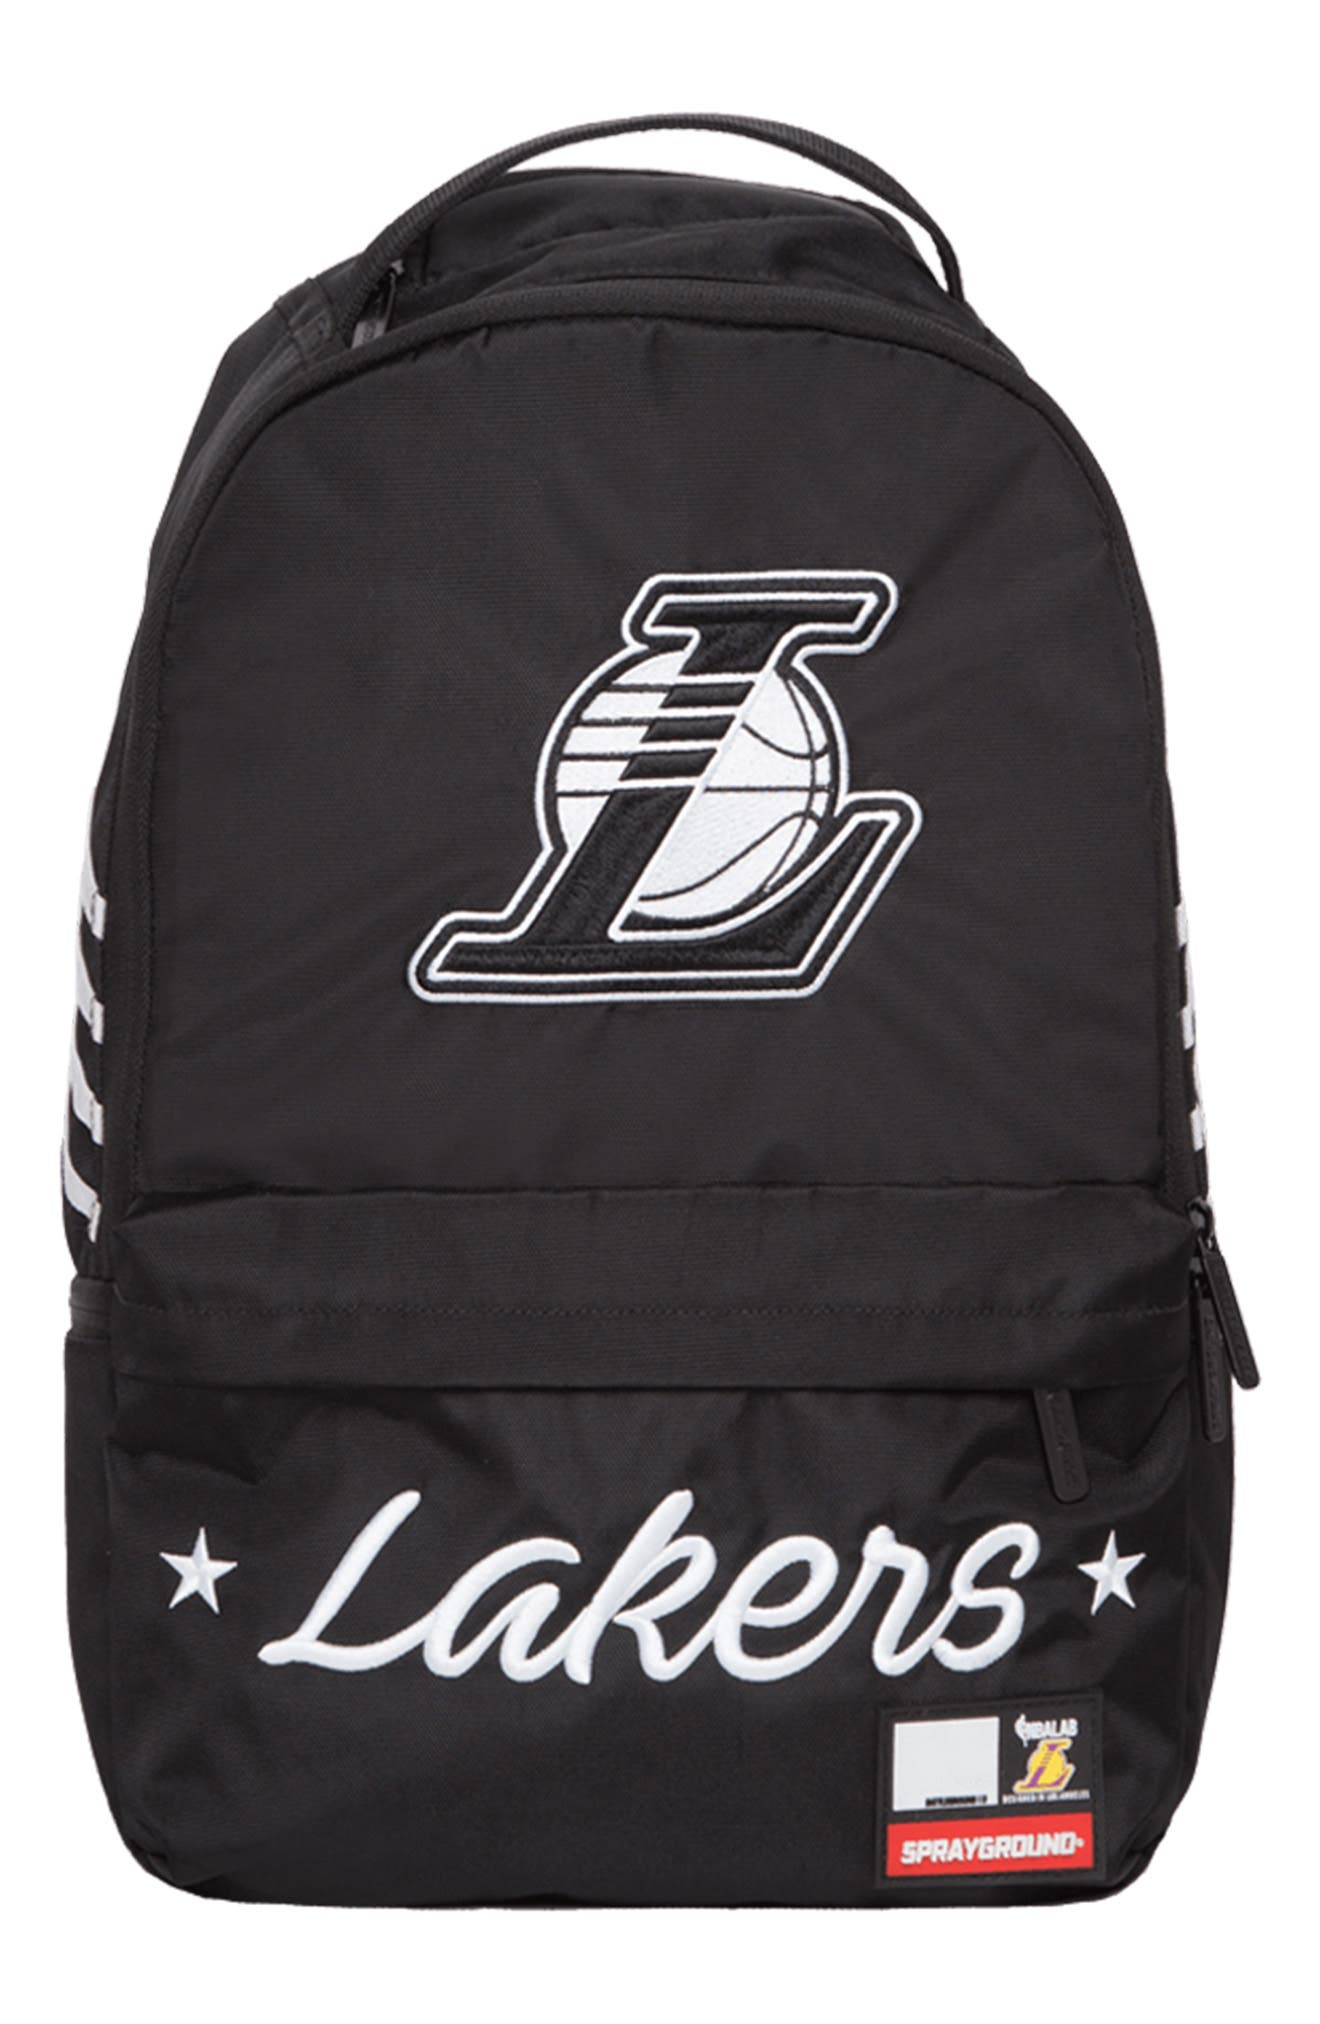 SPRAYGROUND Los Angeles Lakers Cargo Backpack - Black